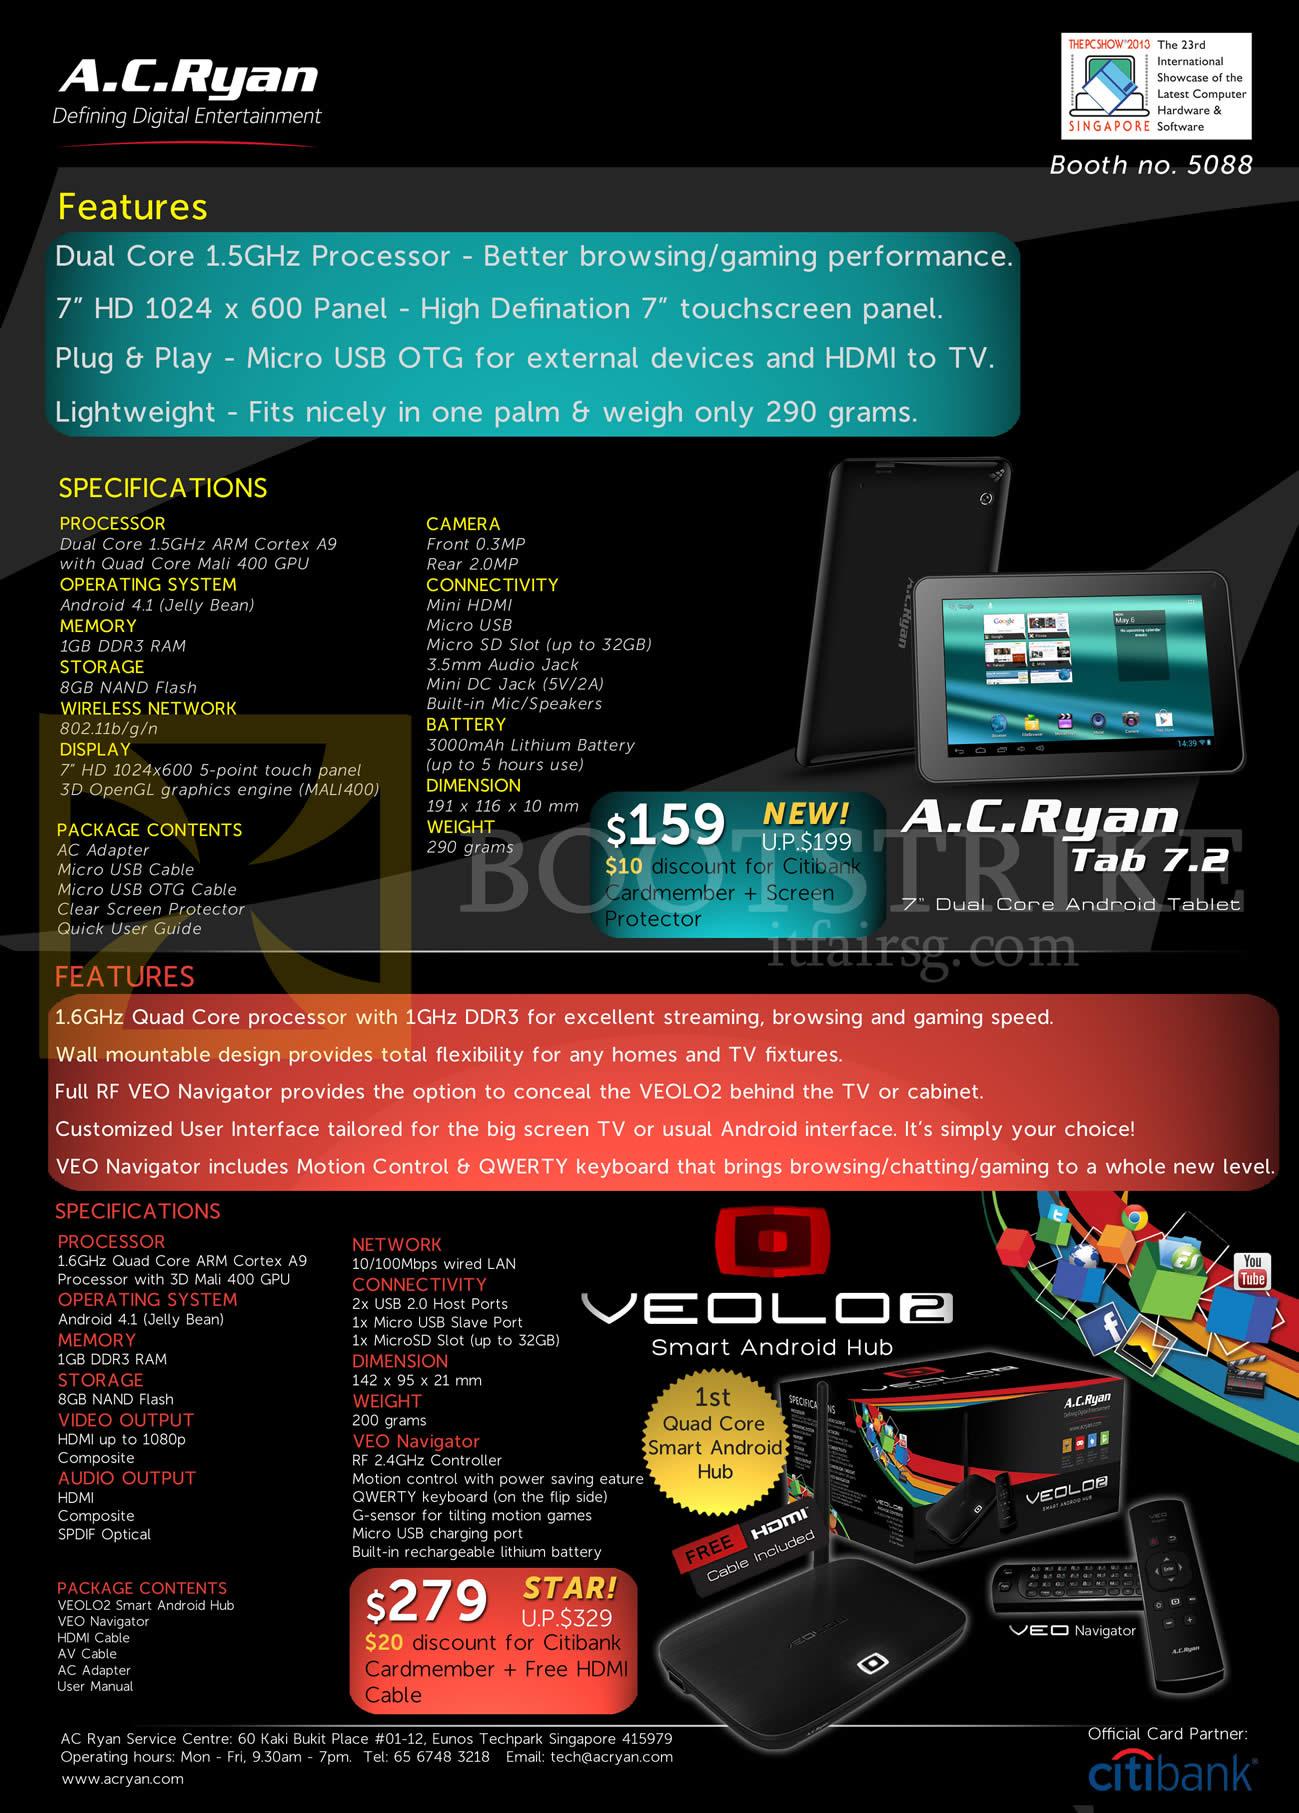 PC SHOW 2013 price list image brochure of AC Ryan Tab 7.2 Tablet, Veolo 2 Smart Android Hub